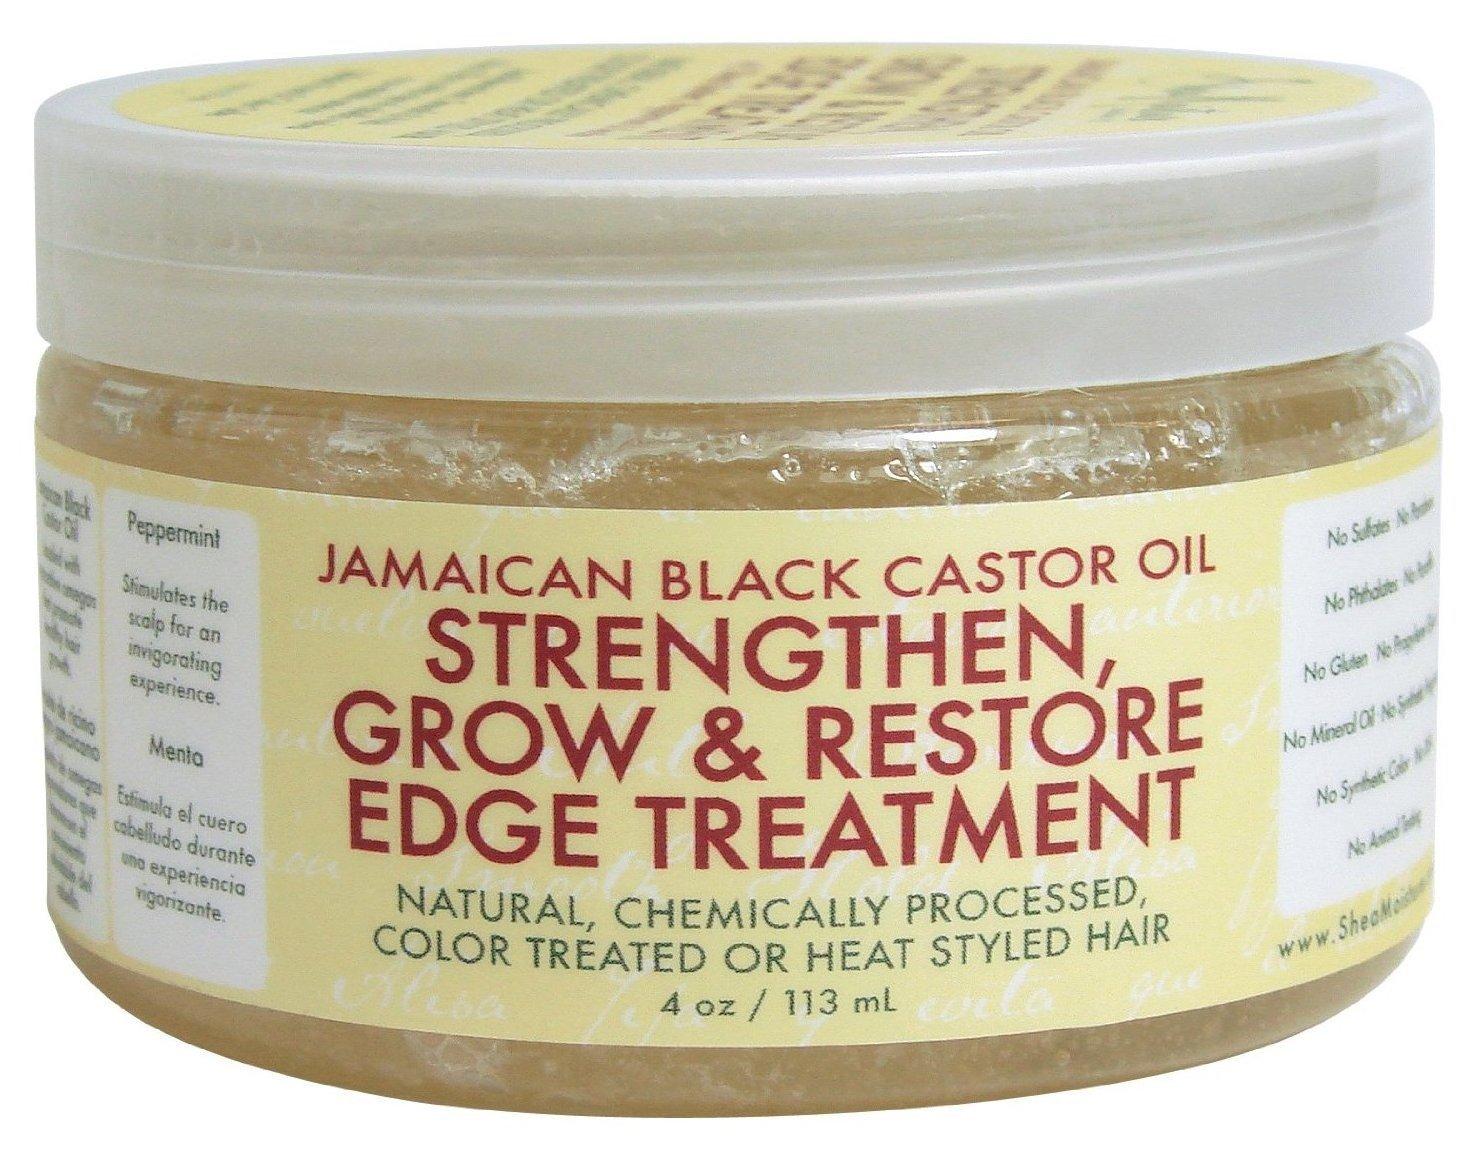 Shea Moisture Grow And Restore Edge Treatment 4oz Jamaican Black Castor Oil (2 Pack)